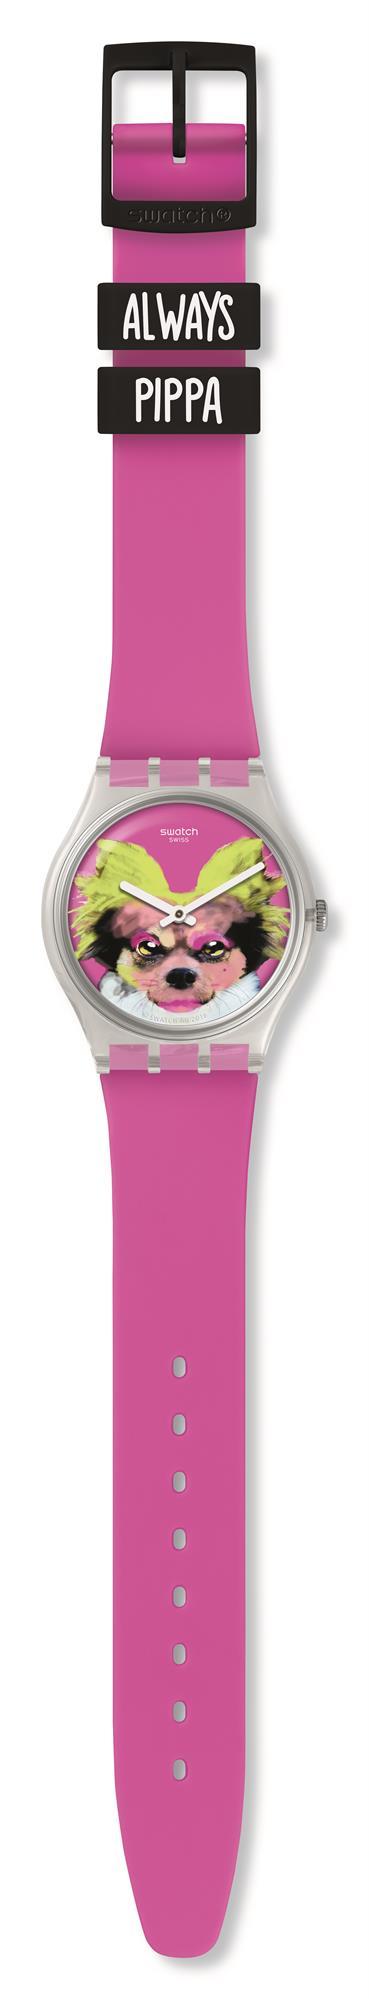 Swatch Pinkapippa Always Pippa Dog Pink Silicone Strap Girls Watch GE267 34mm